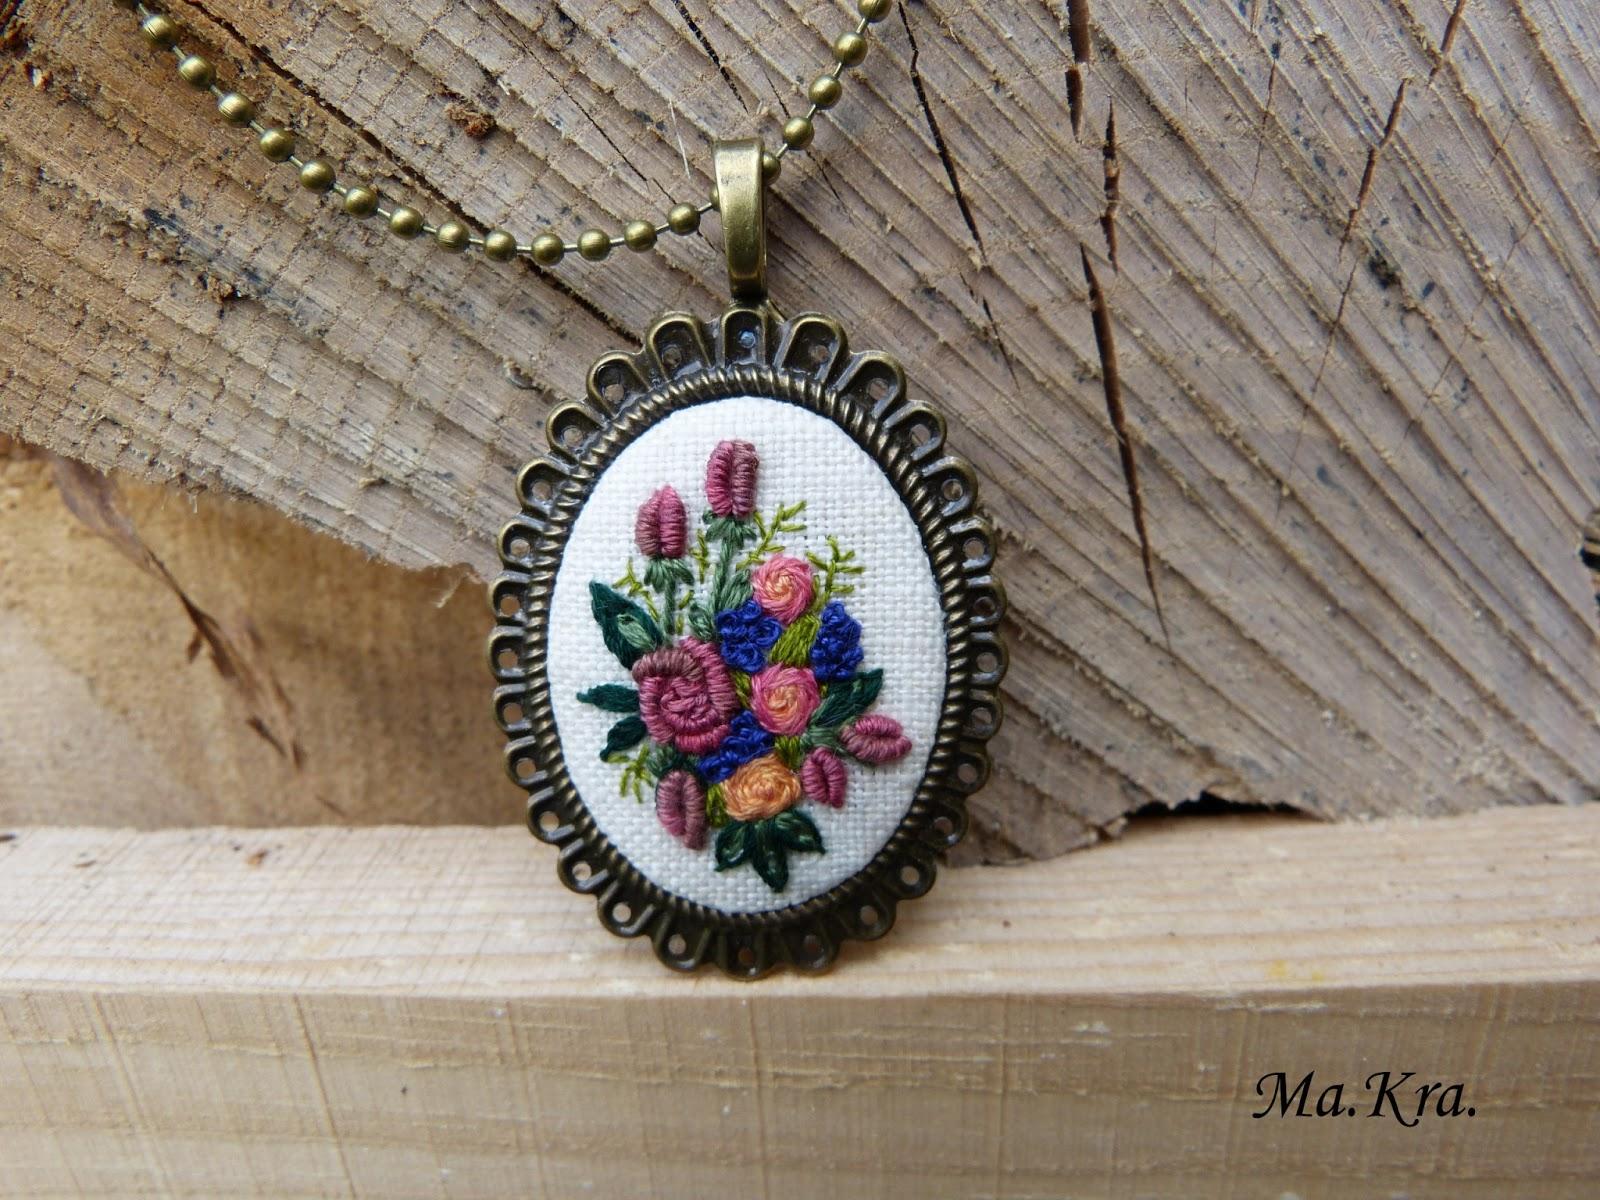 biżuteria z haftem